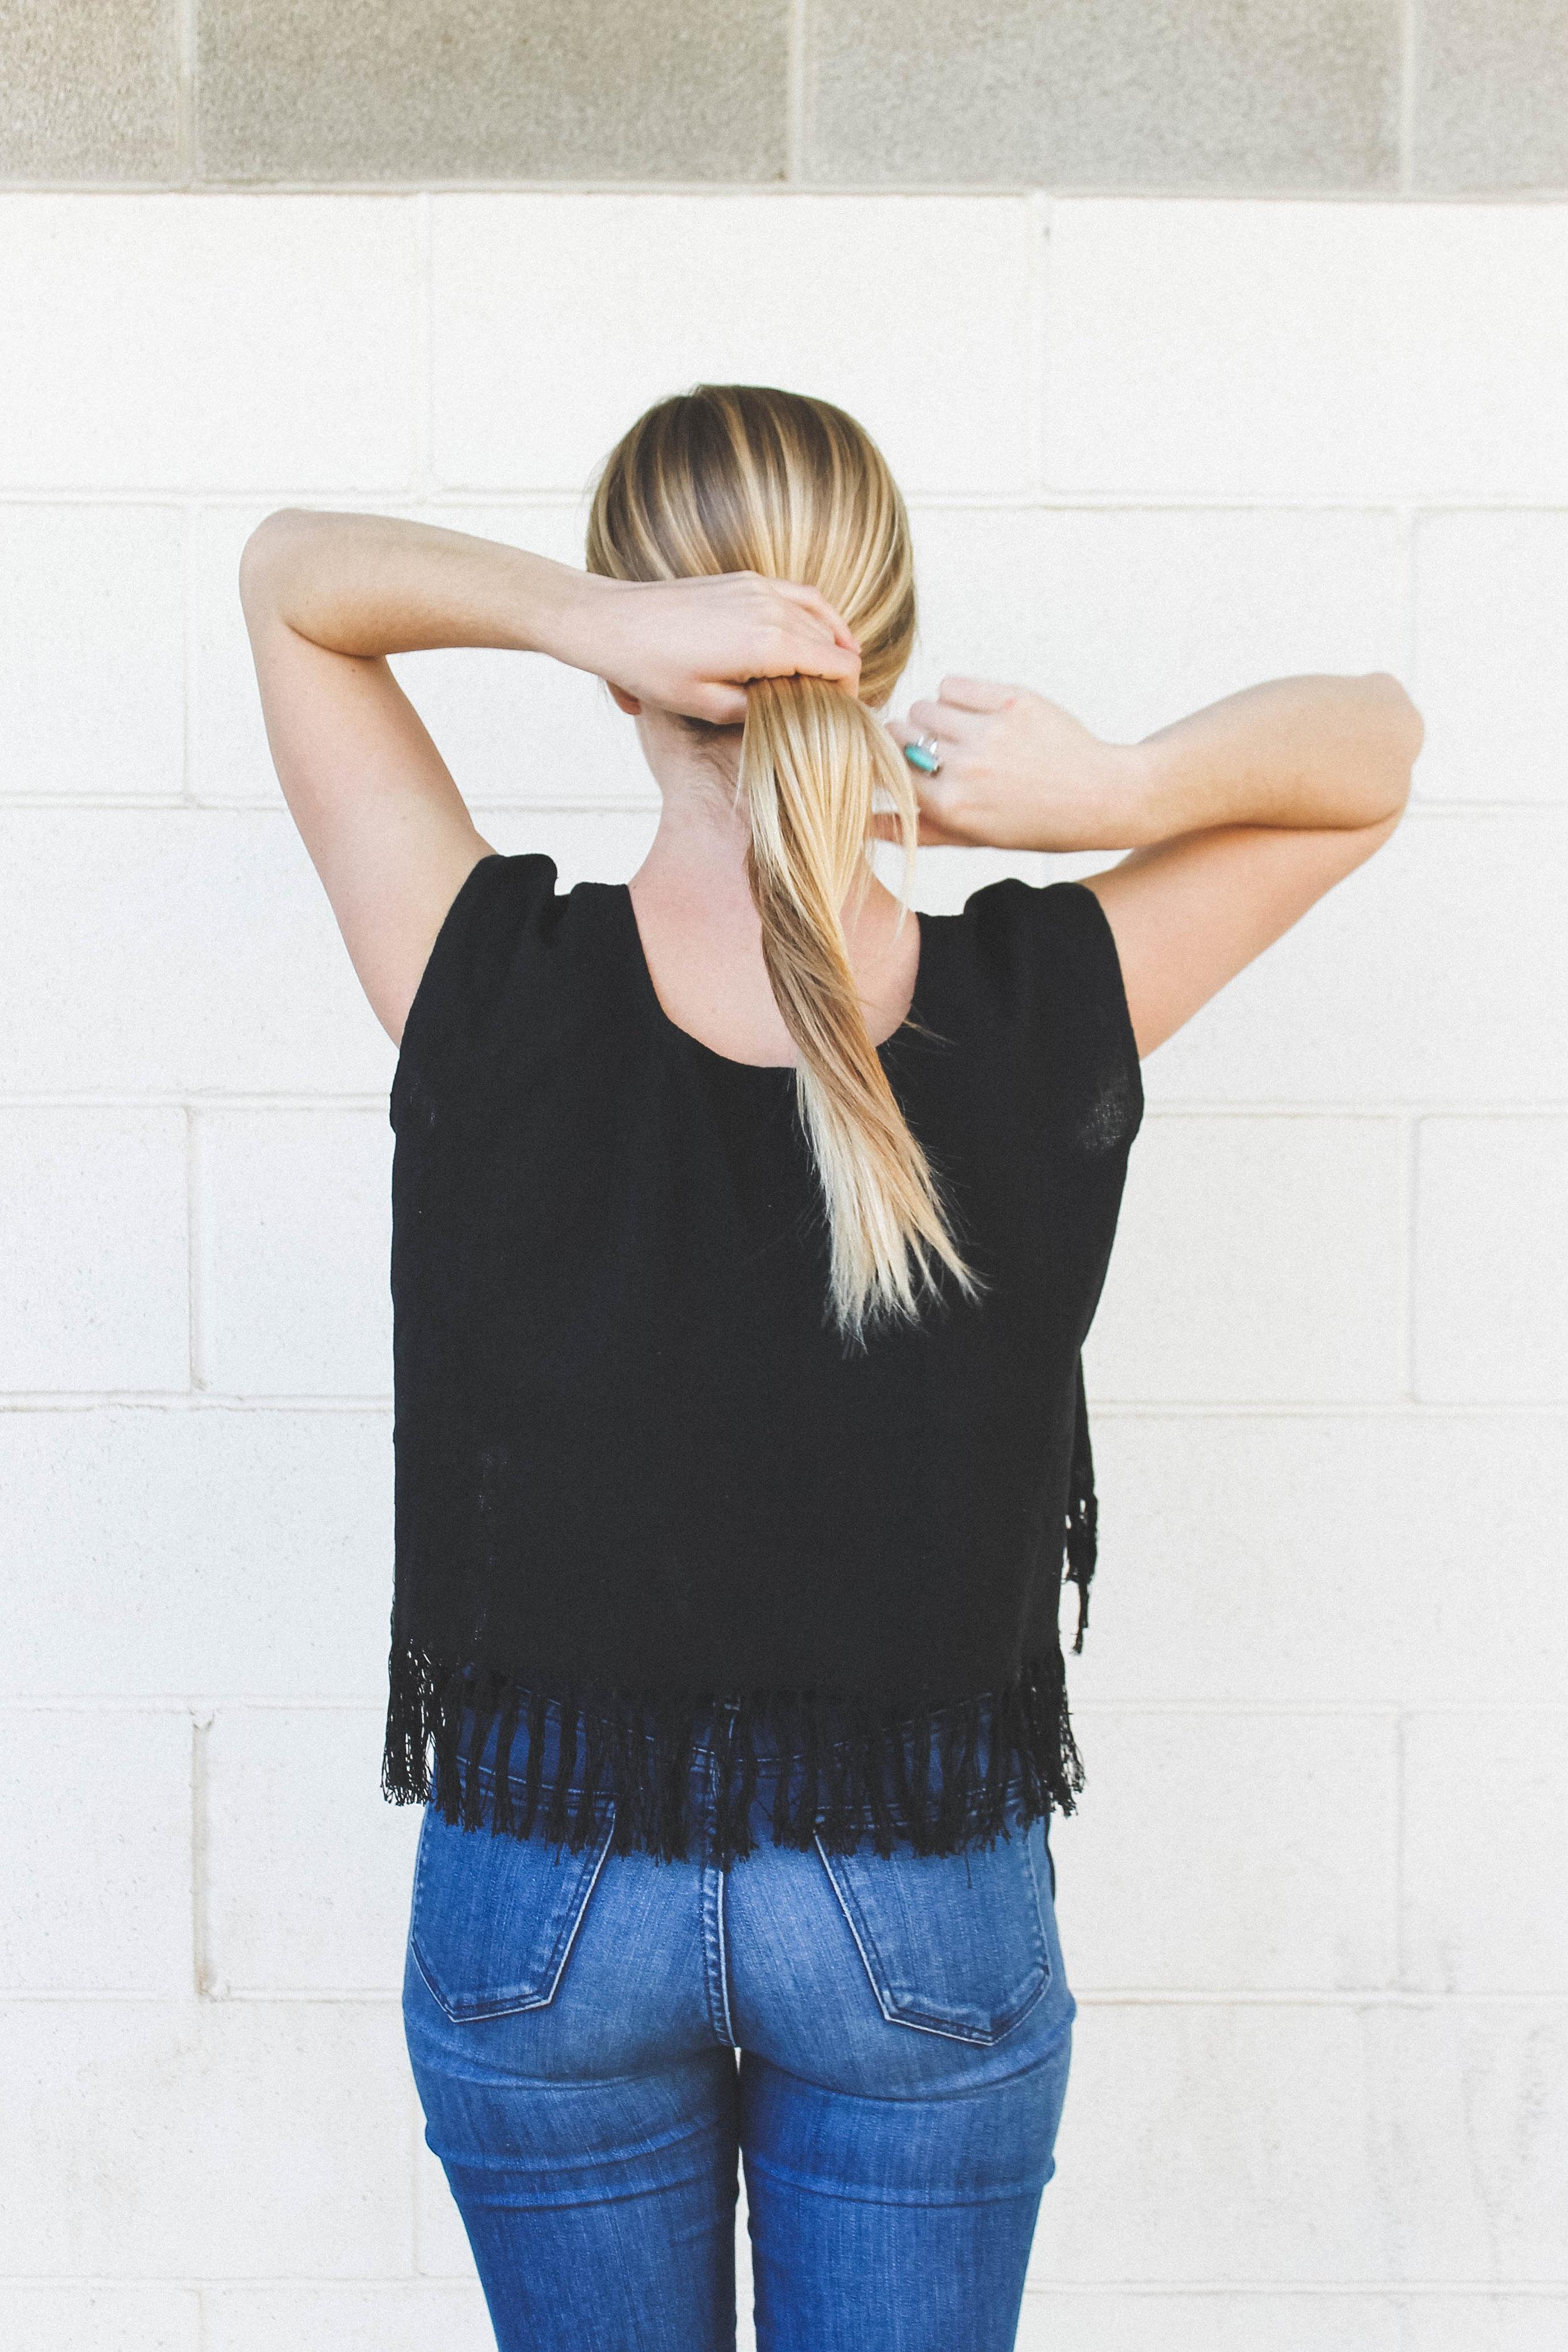 spring-2018-lookbook-shirt-black-8.jpg